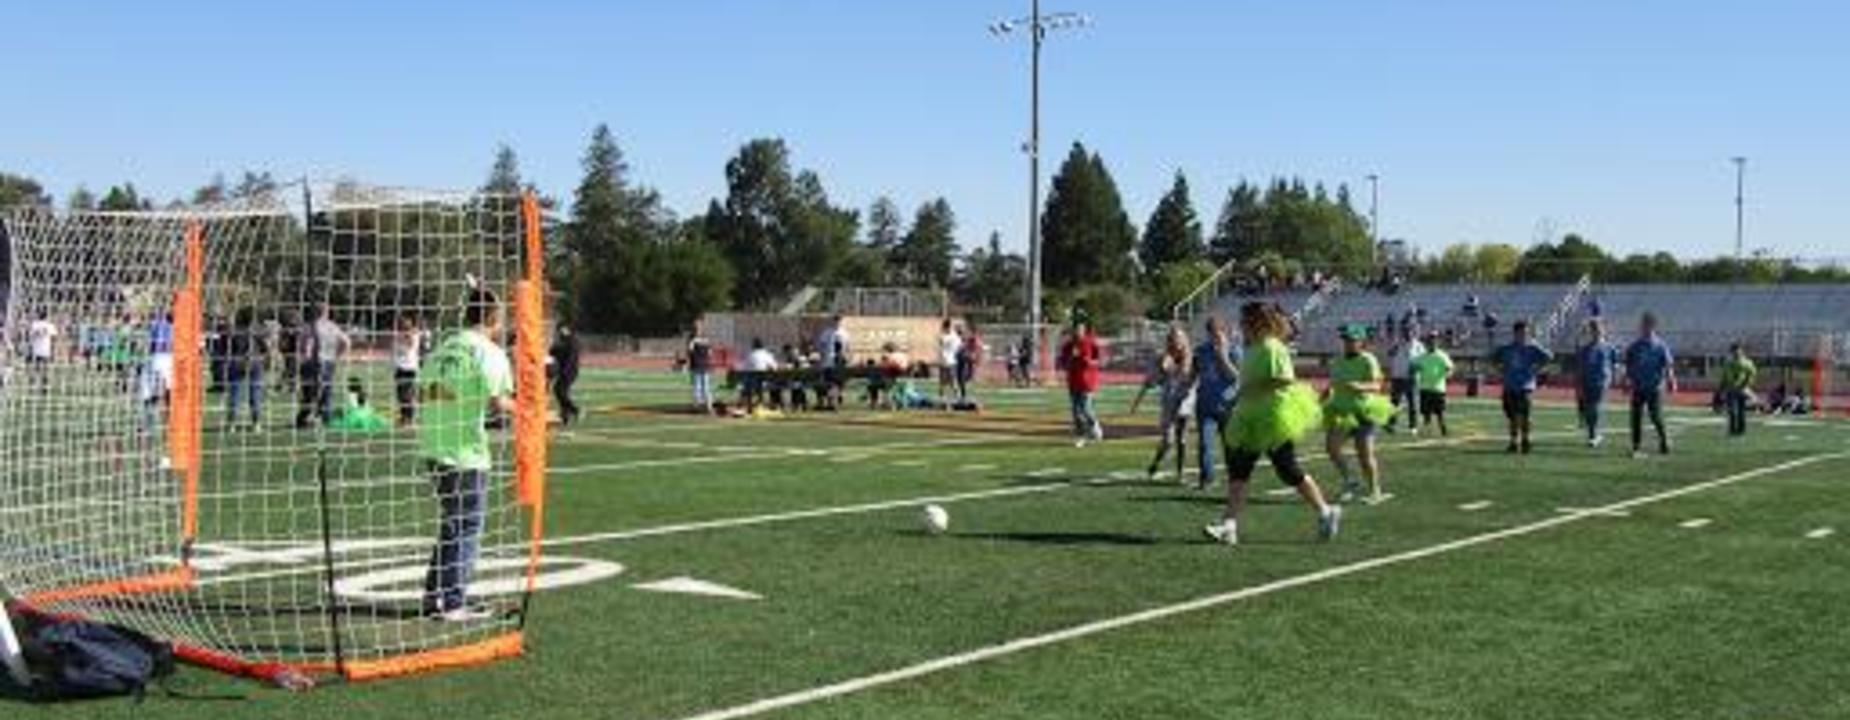 Roy Johnson Adult Transition Program With Castro Valley School District Calendar 2021